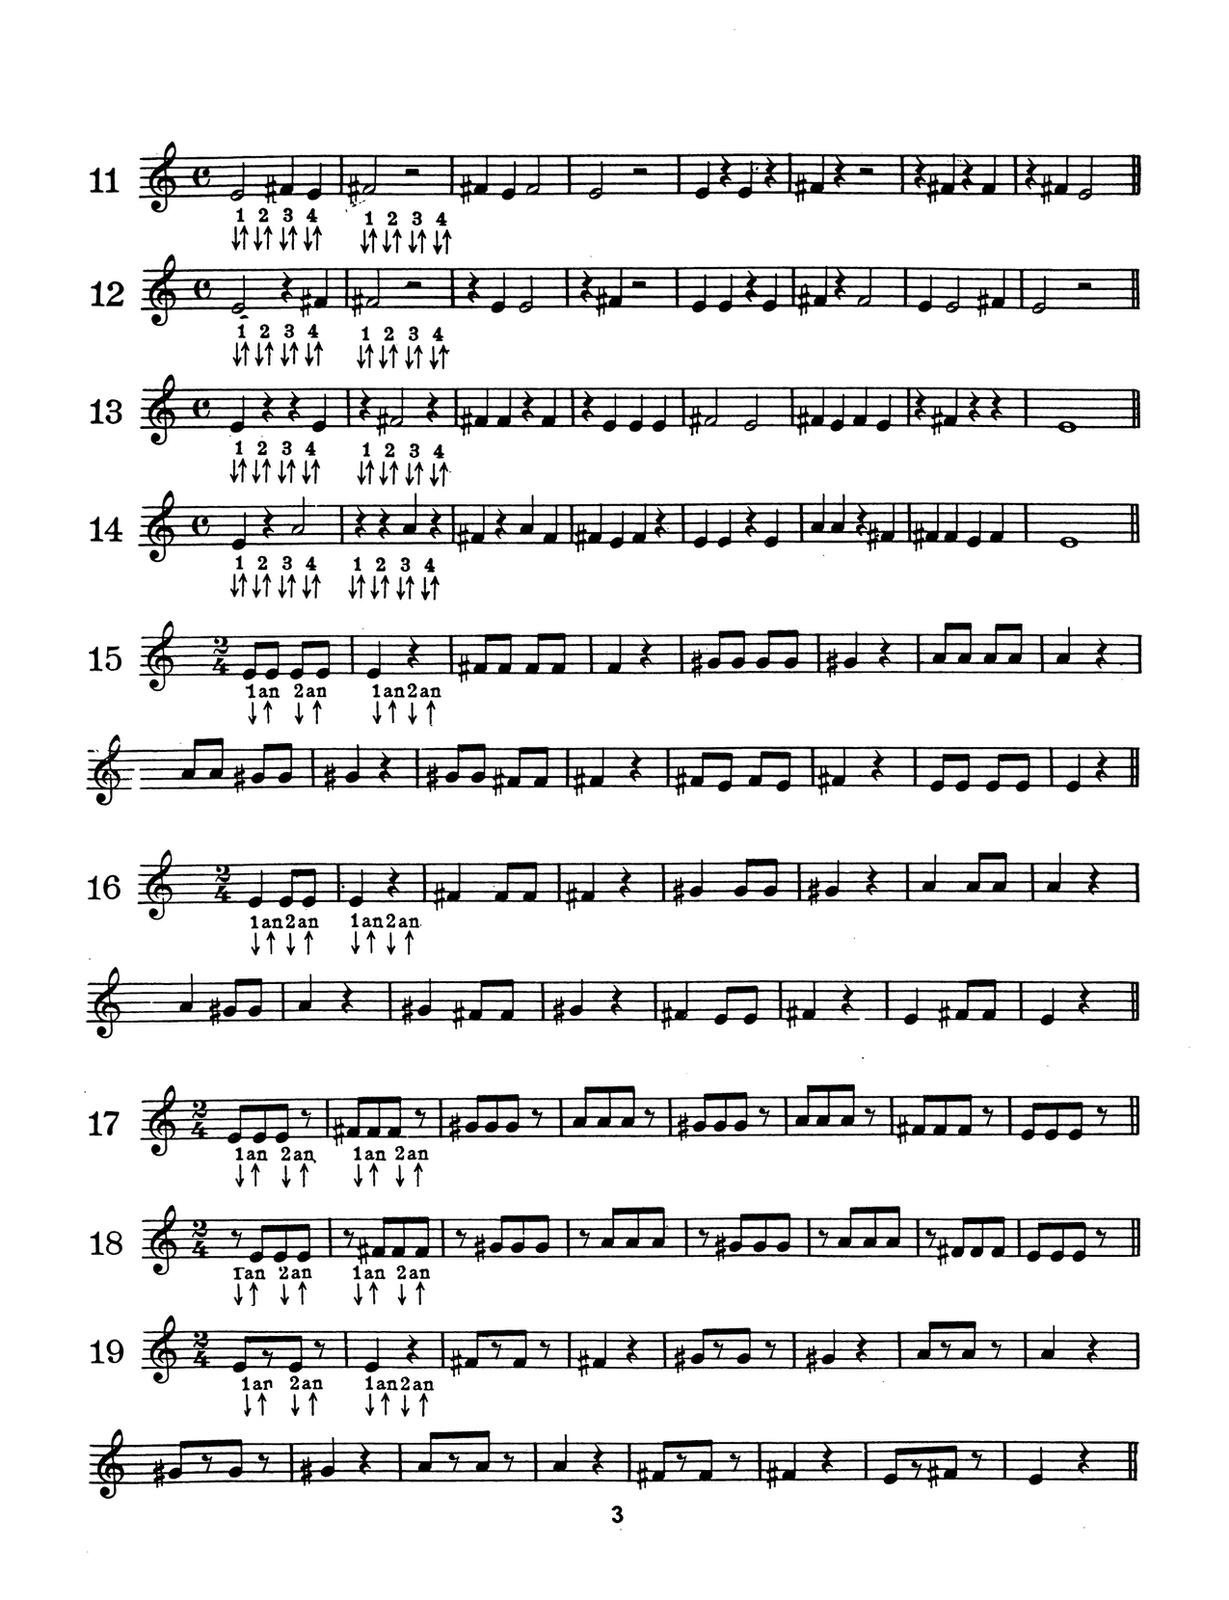 Yaus, Easy Steps to Rhythm, Bb 3